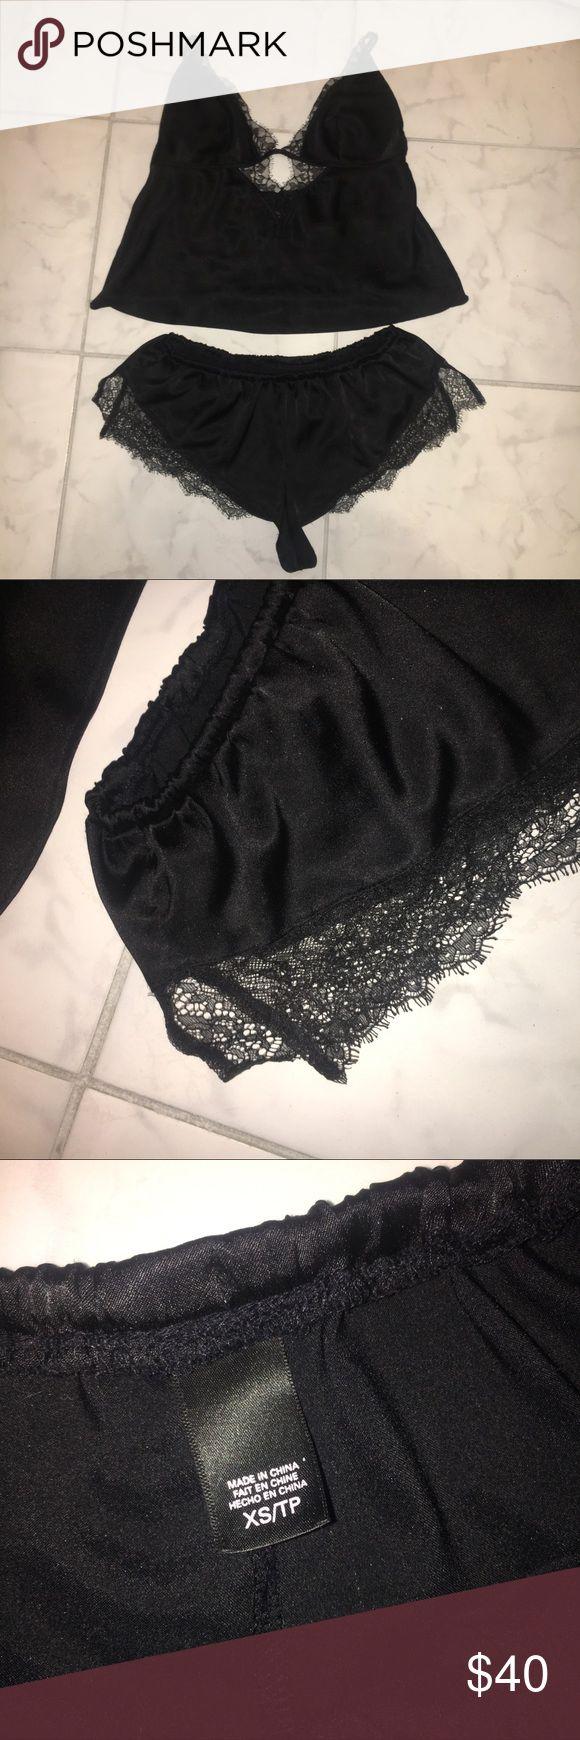 Victoria's Secret Black Silk Pajama Shorts and Top Top- s Bottom- xs   Adjustable straps on top Victoria's Secret Intimates & Sleepwear Pajamas